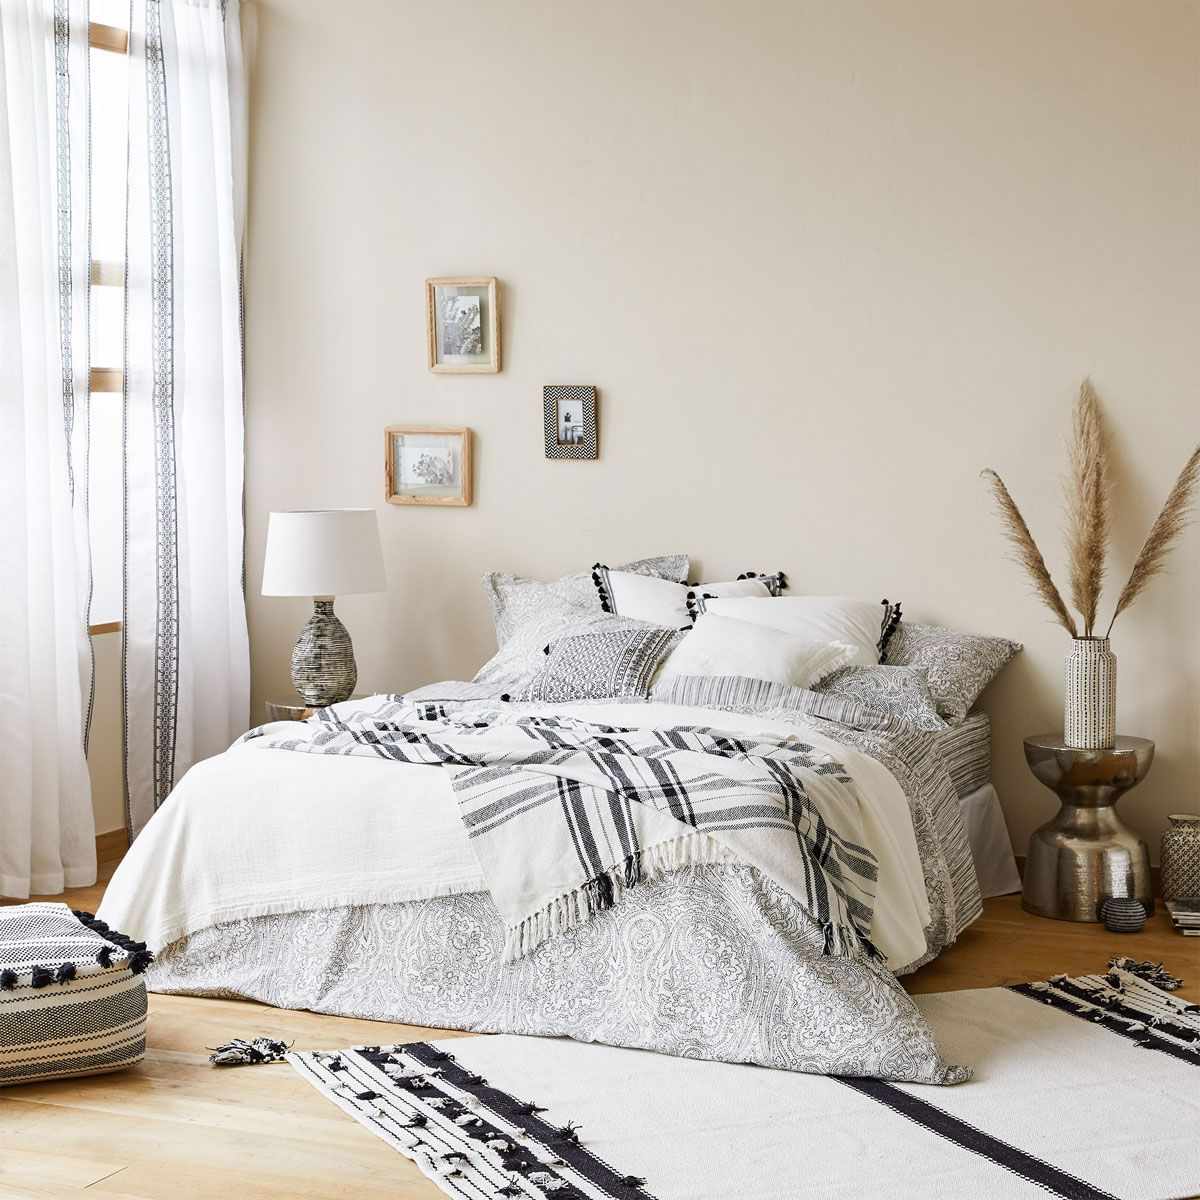 Zara home interior design - Tapis En Coton Pompons Blancs Et Noirs Stripe Printzara Homethe